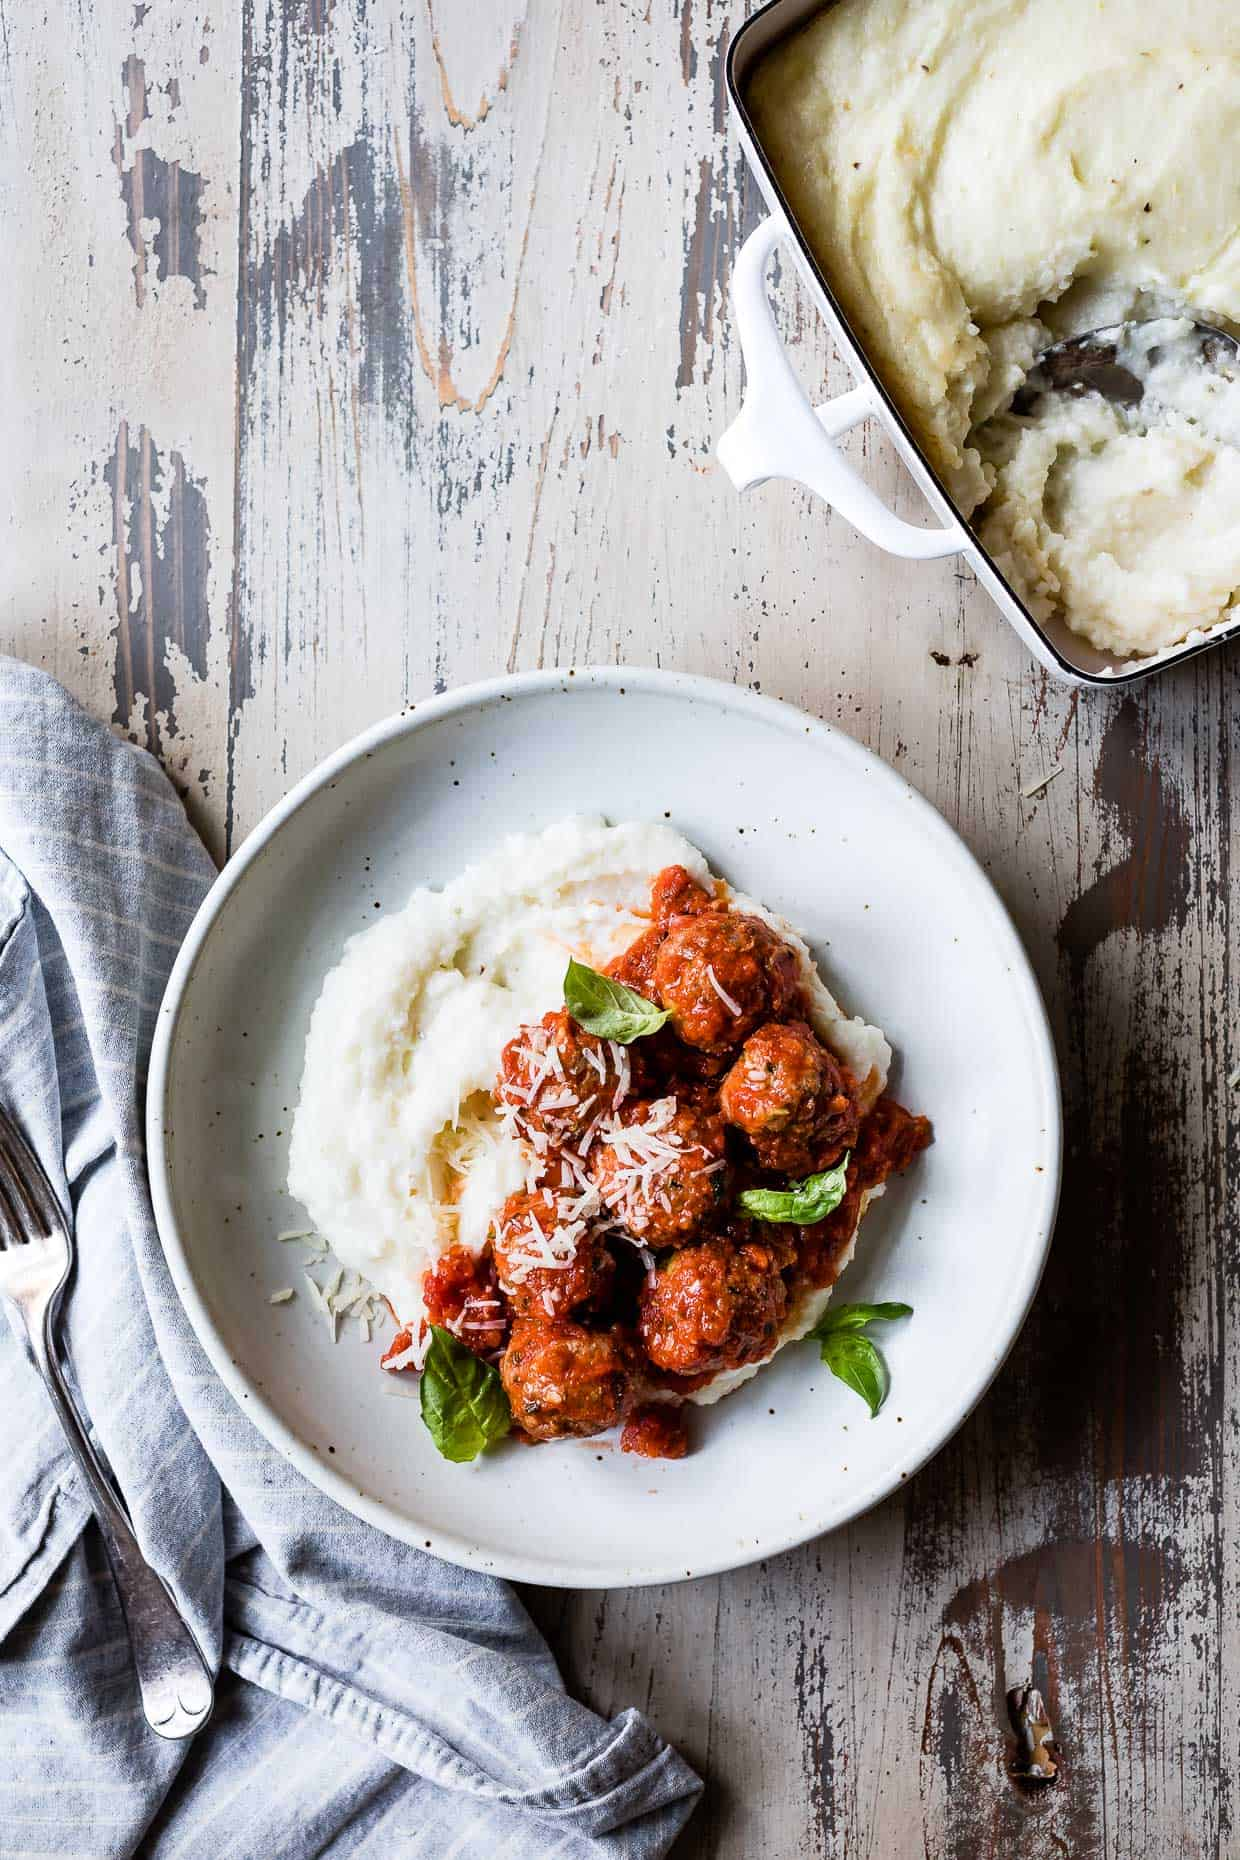 Zucchini Gouda Turkey Meatballs with Cheesy Baked Polenta